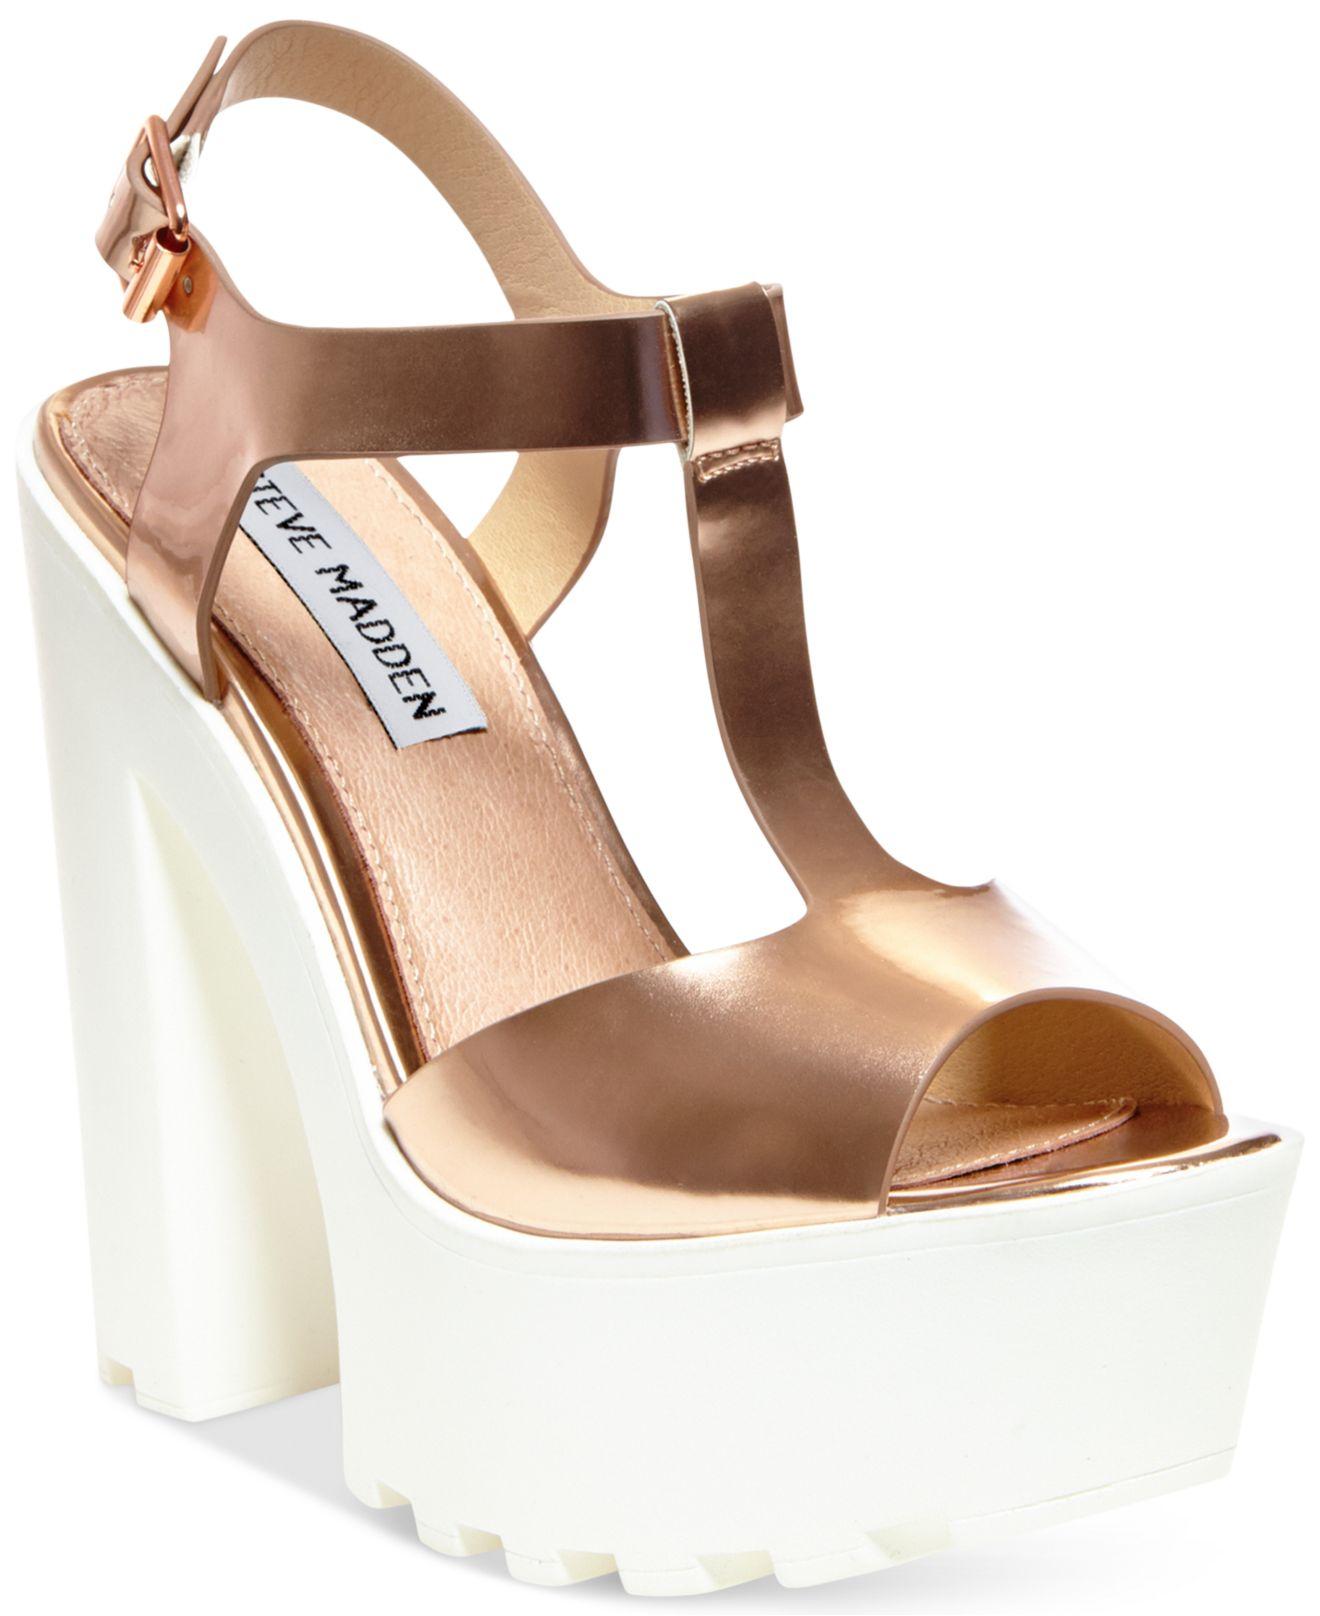 83734de5280f Lyst - Steve Madden Girltalk Platform Wedge Sandals in Pink